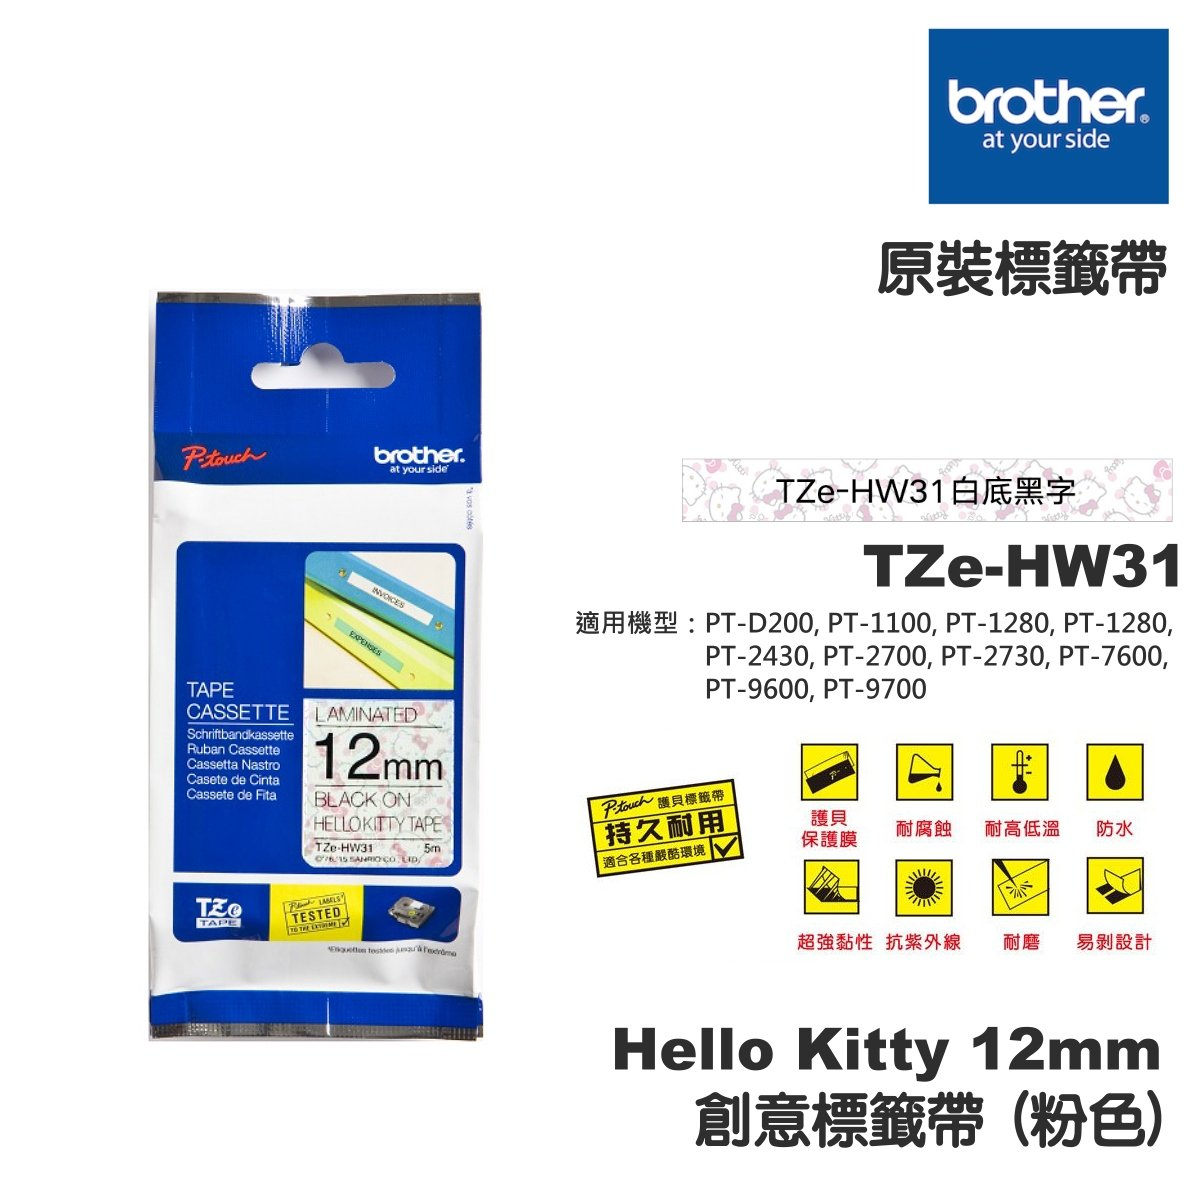 Brother TZe-HW31 Laminated 12mm Tape Cassette Black on Hello Kitty